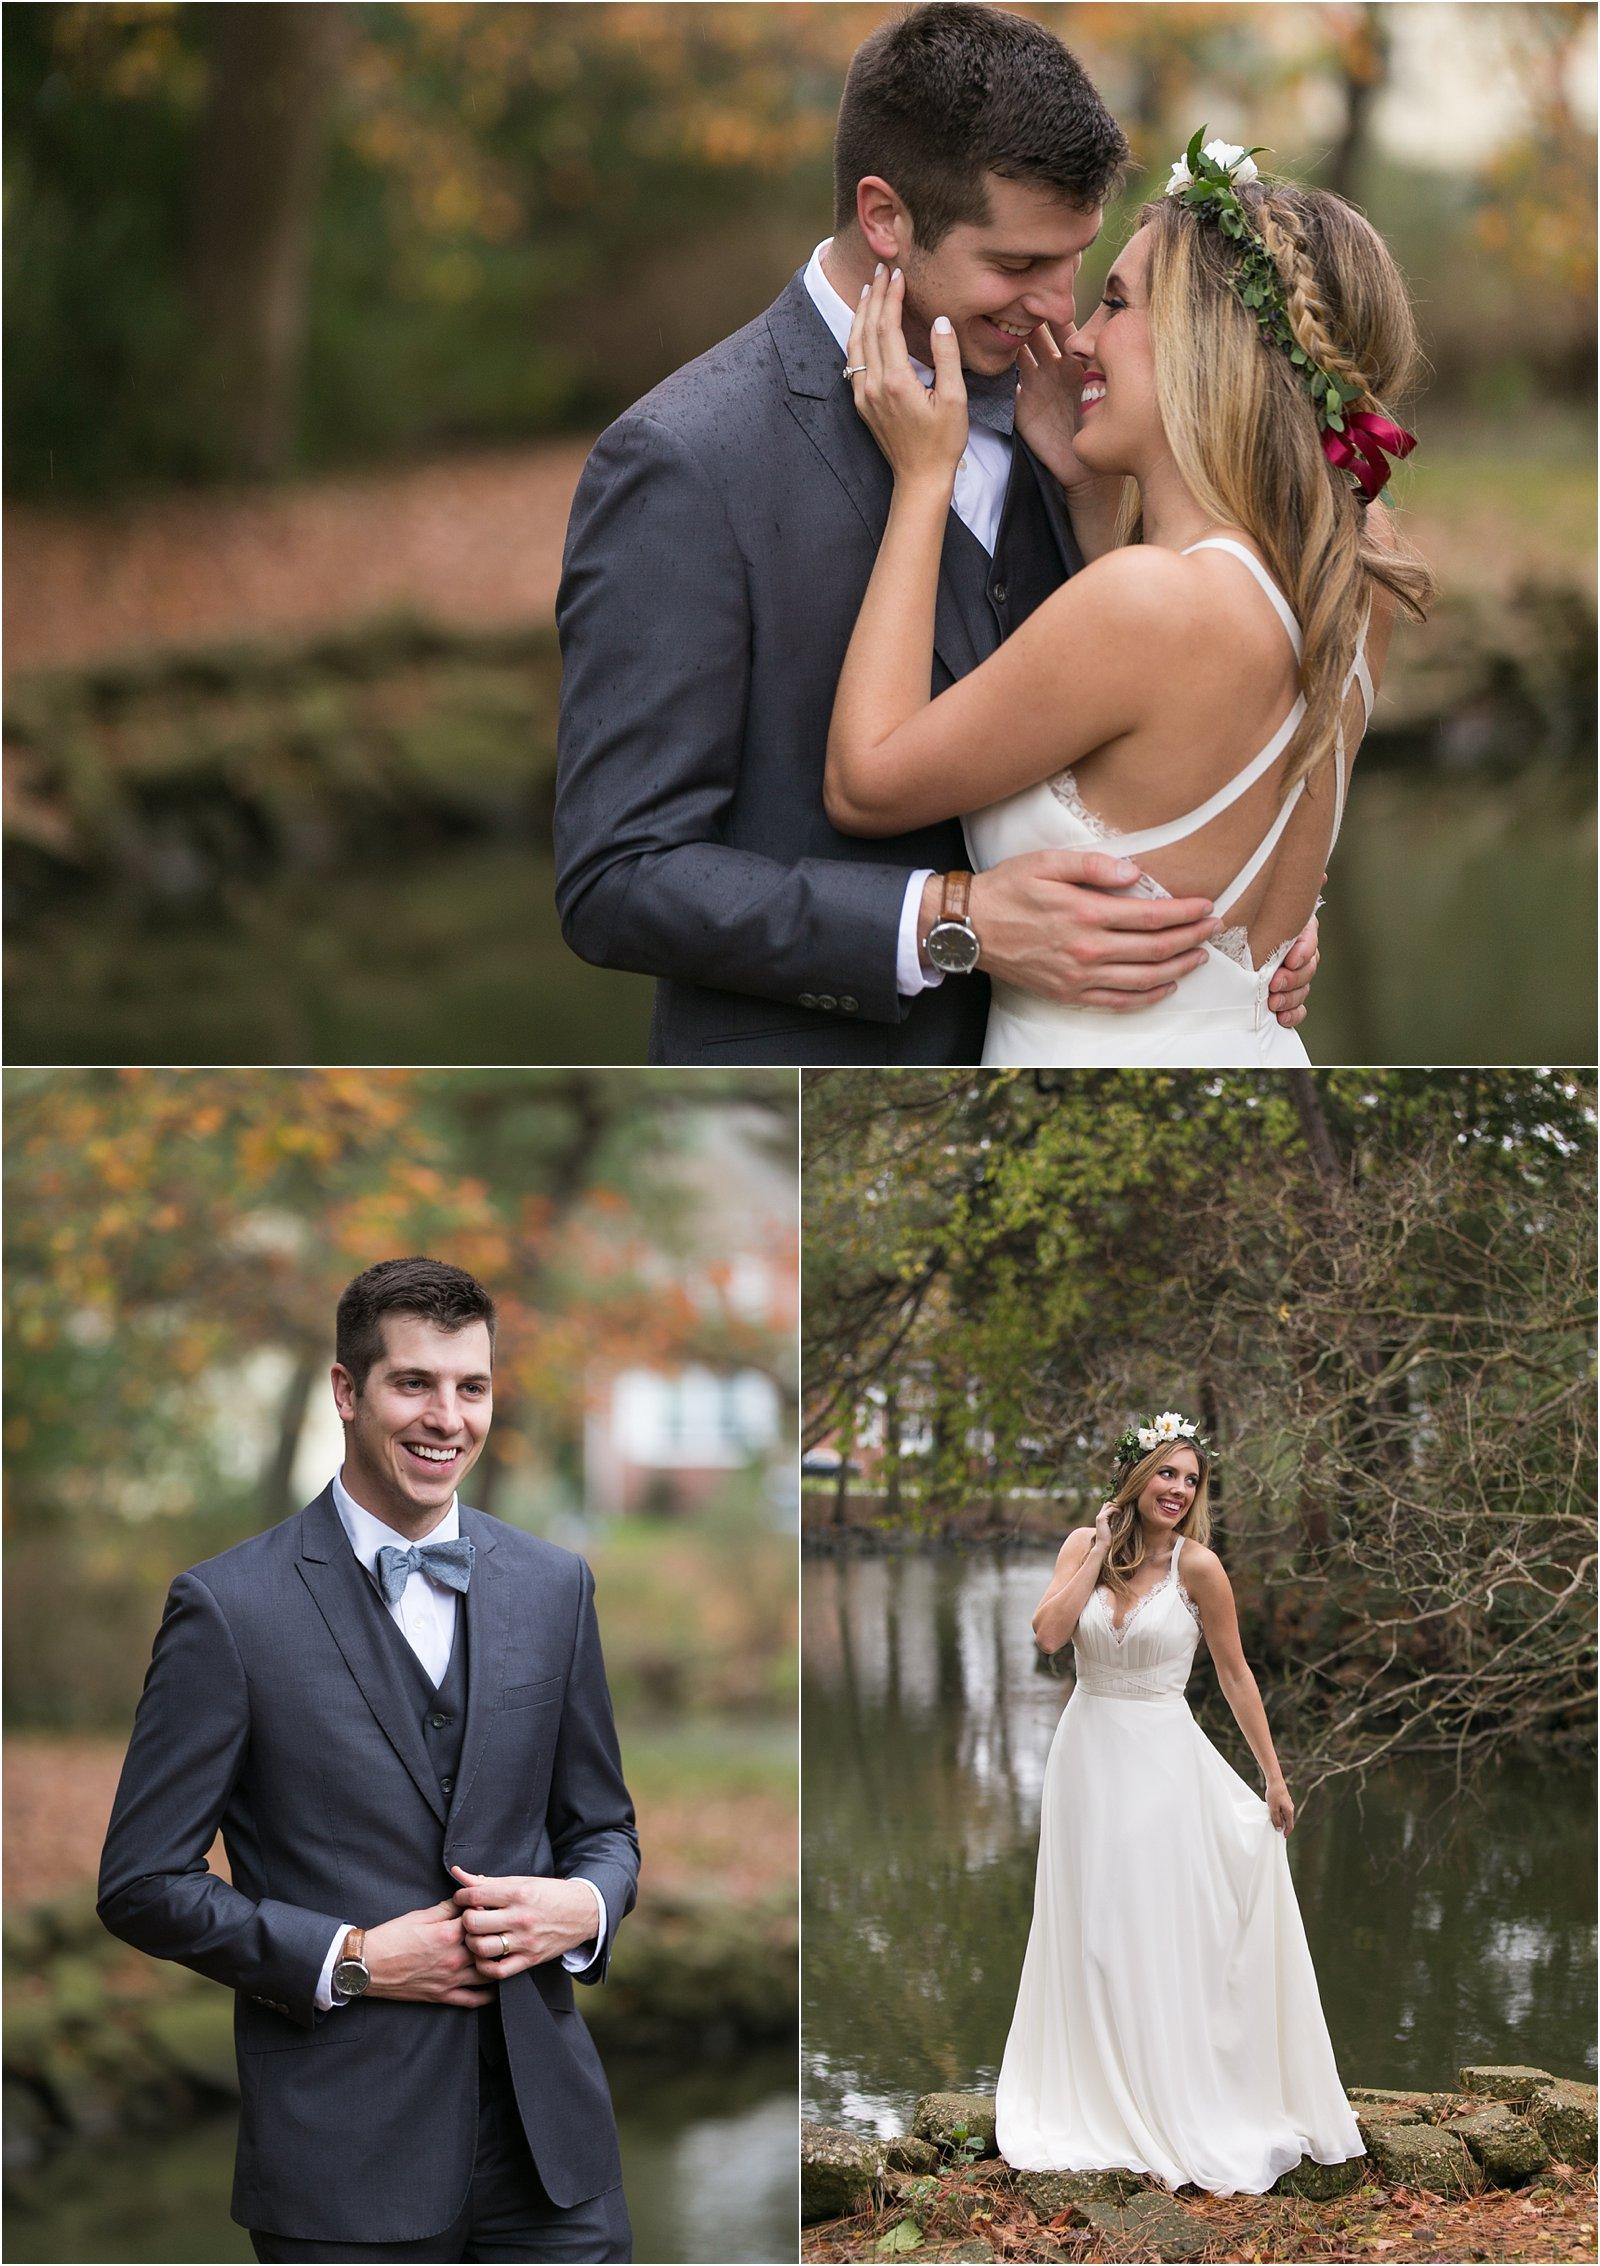 jessica_ryan_photography_womans_club_of_portsmouth_wedding_walk_through_a_wedding_bride_and_groom_0209